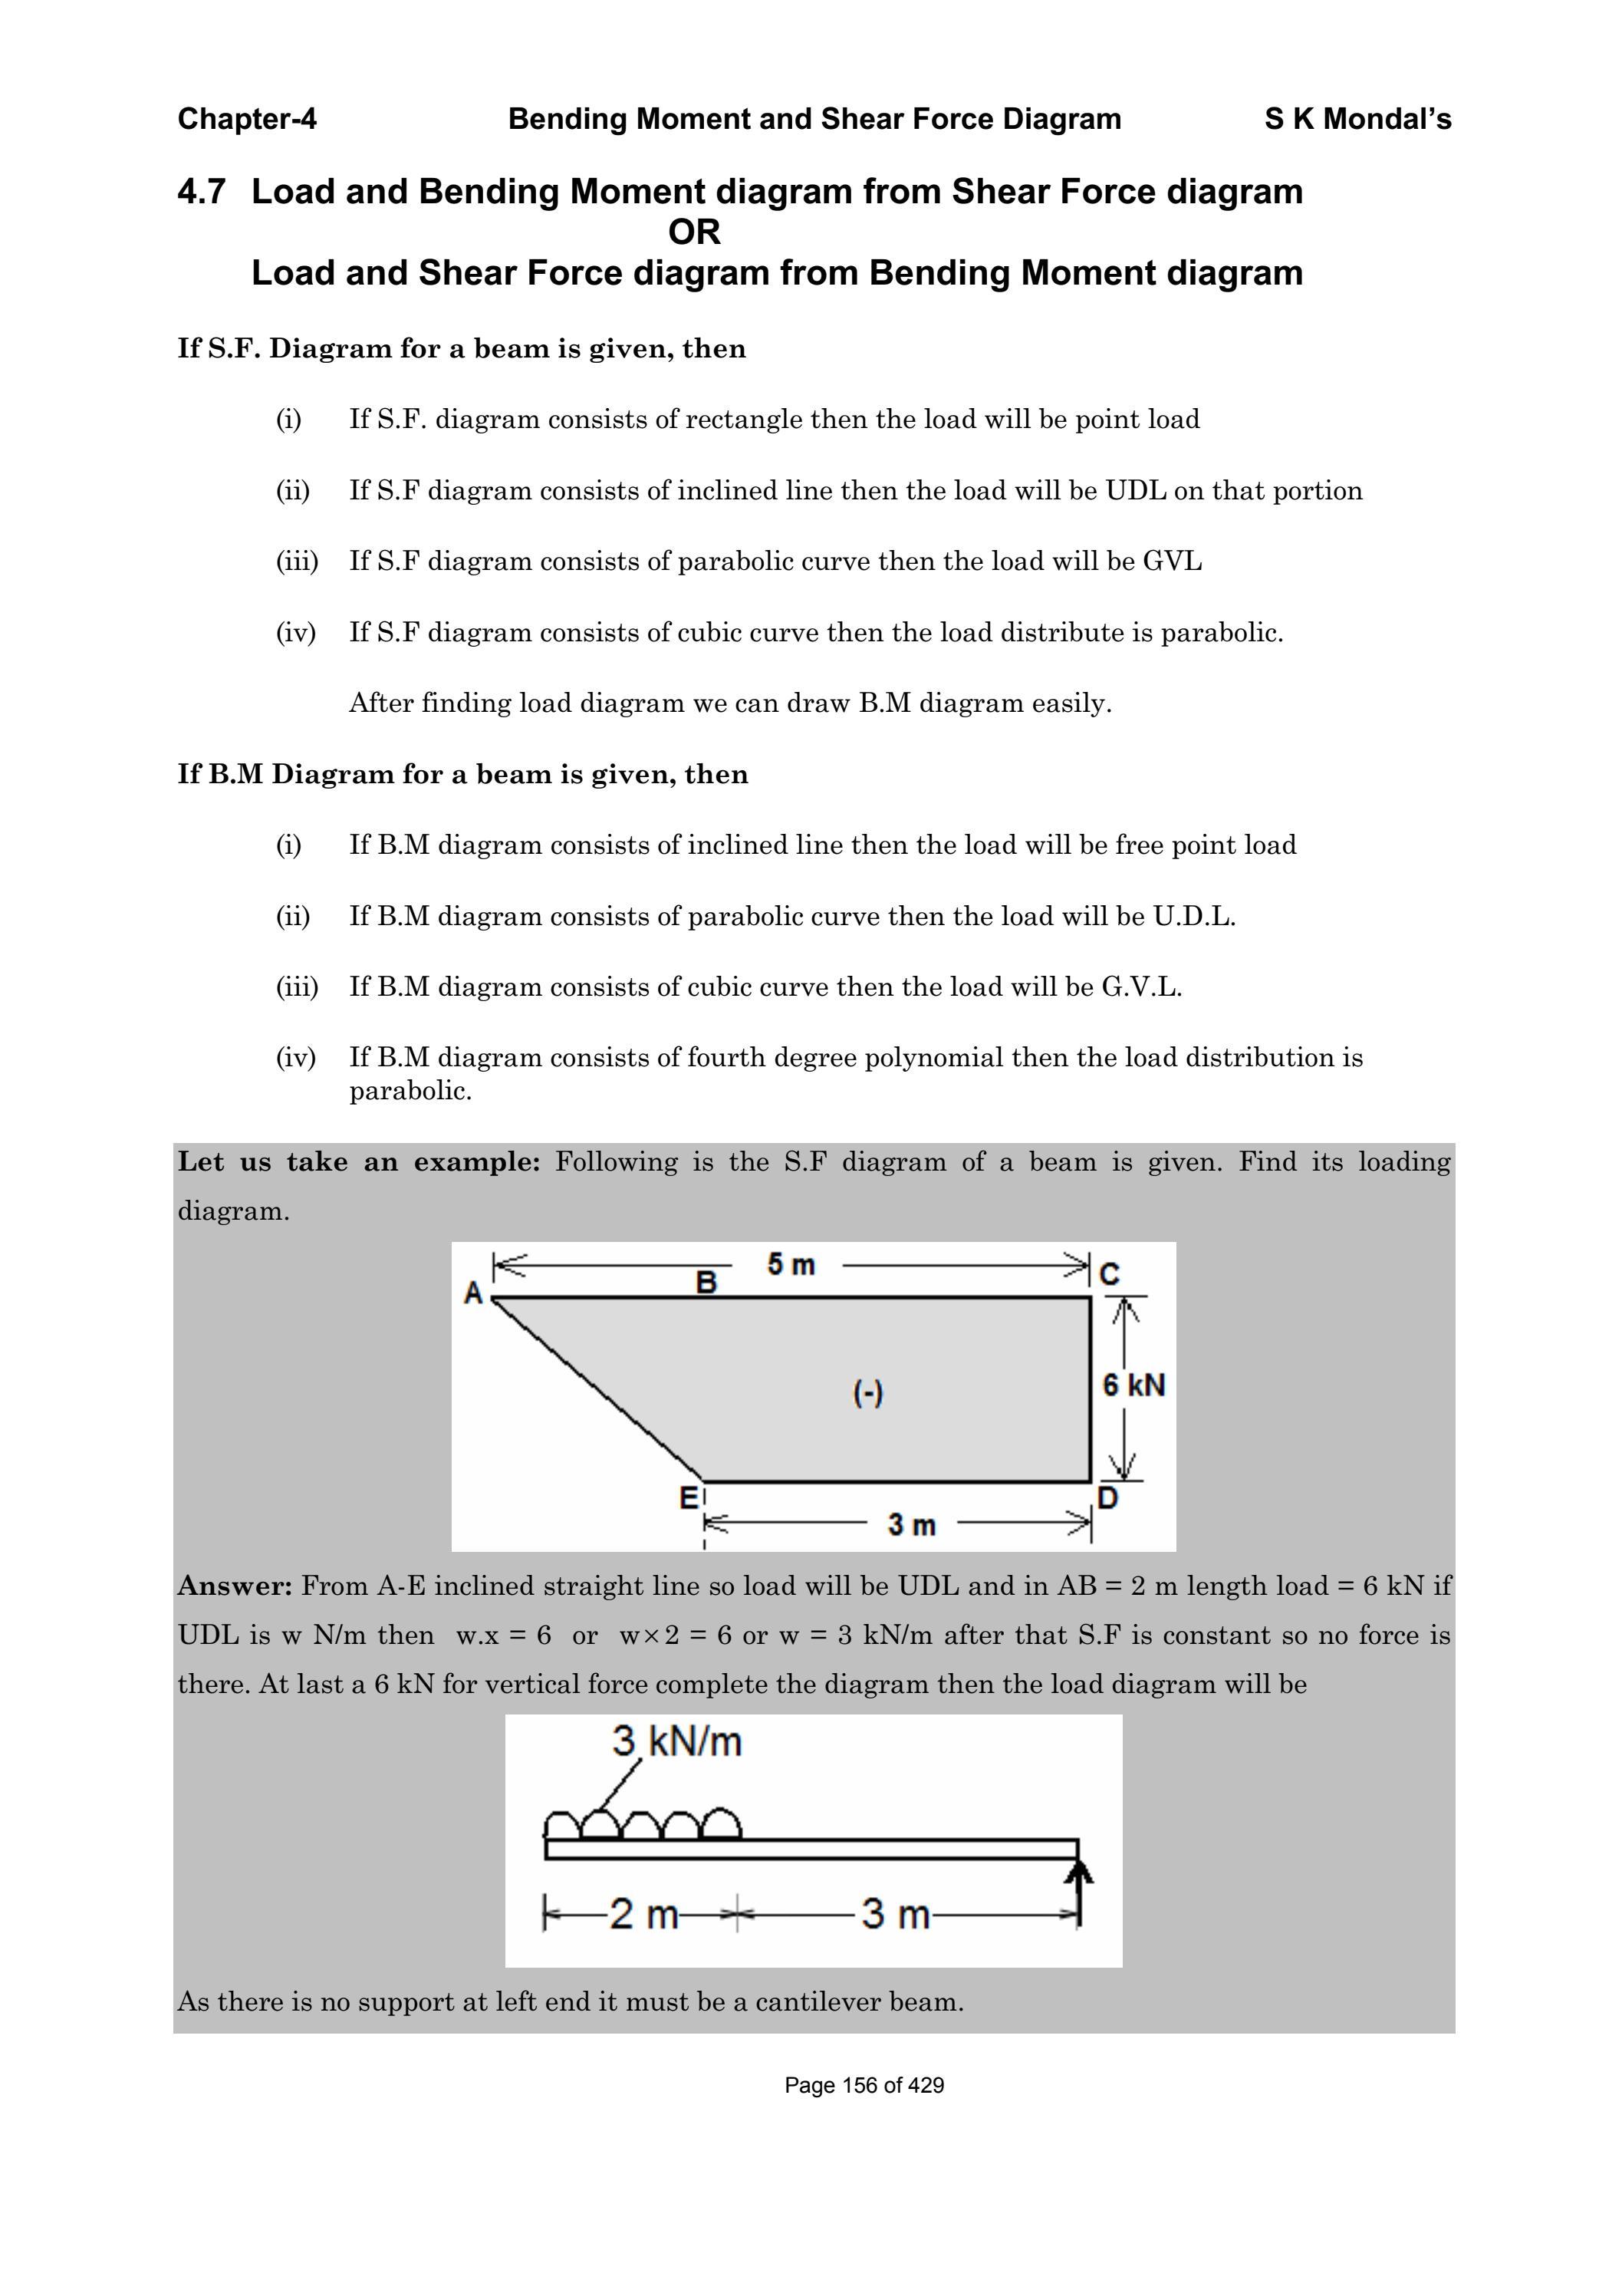 Strength Of Materials By S K Mondal Pdf Sdharmaraj Issuu Shear Bending Moment Diagrams